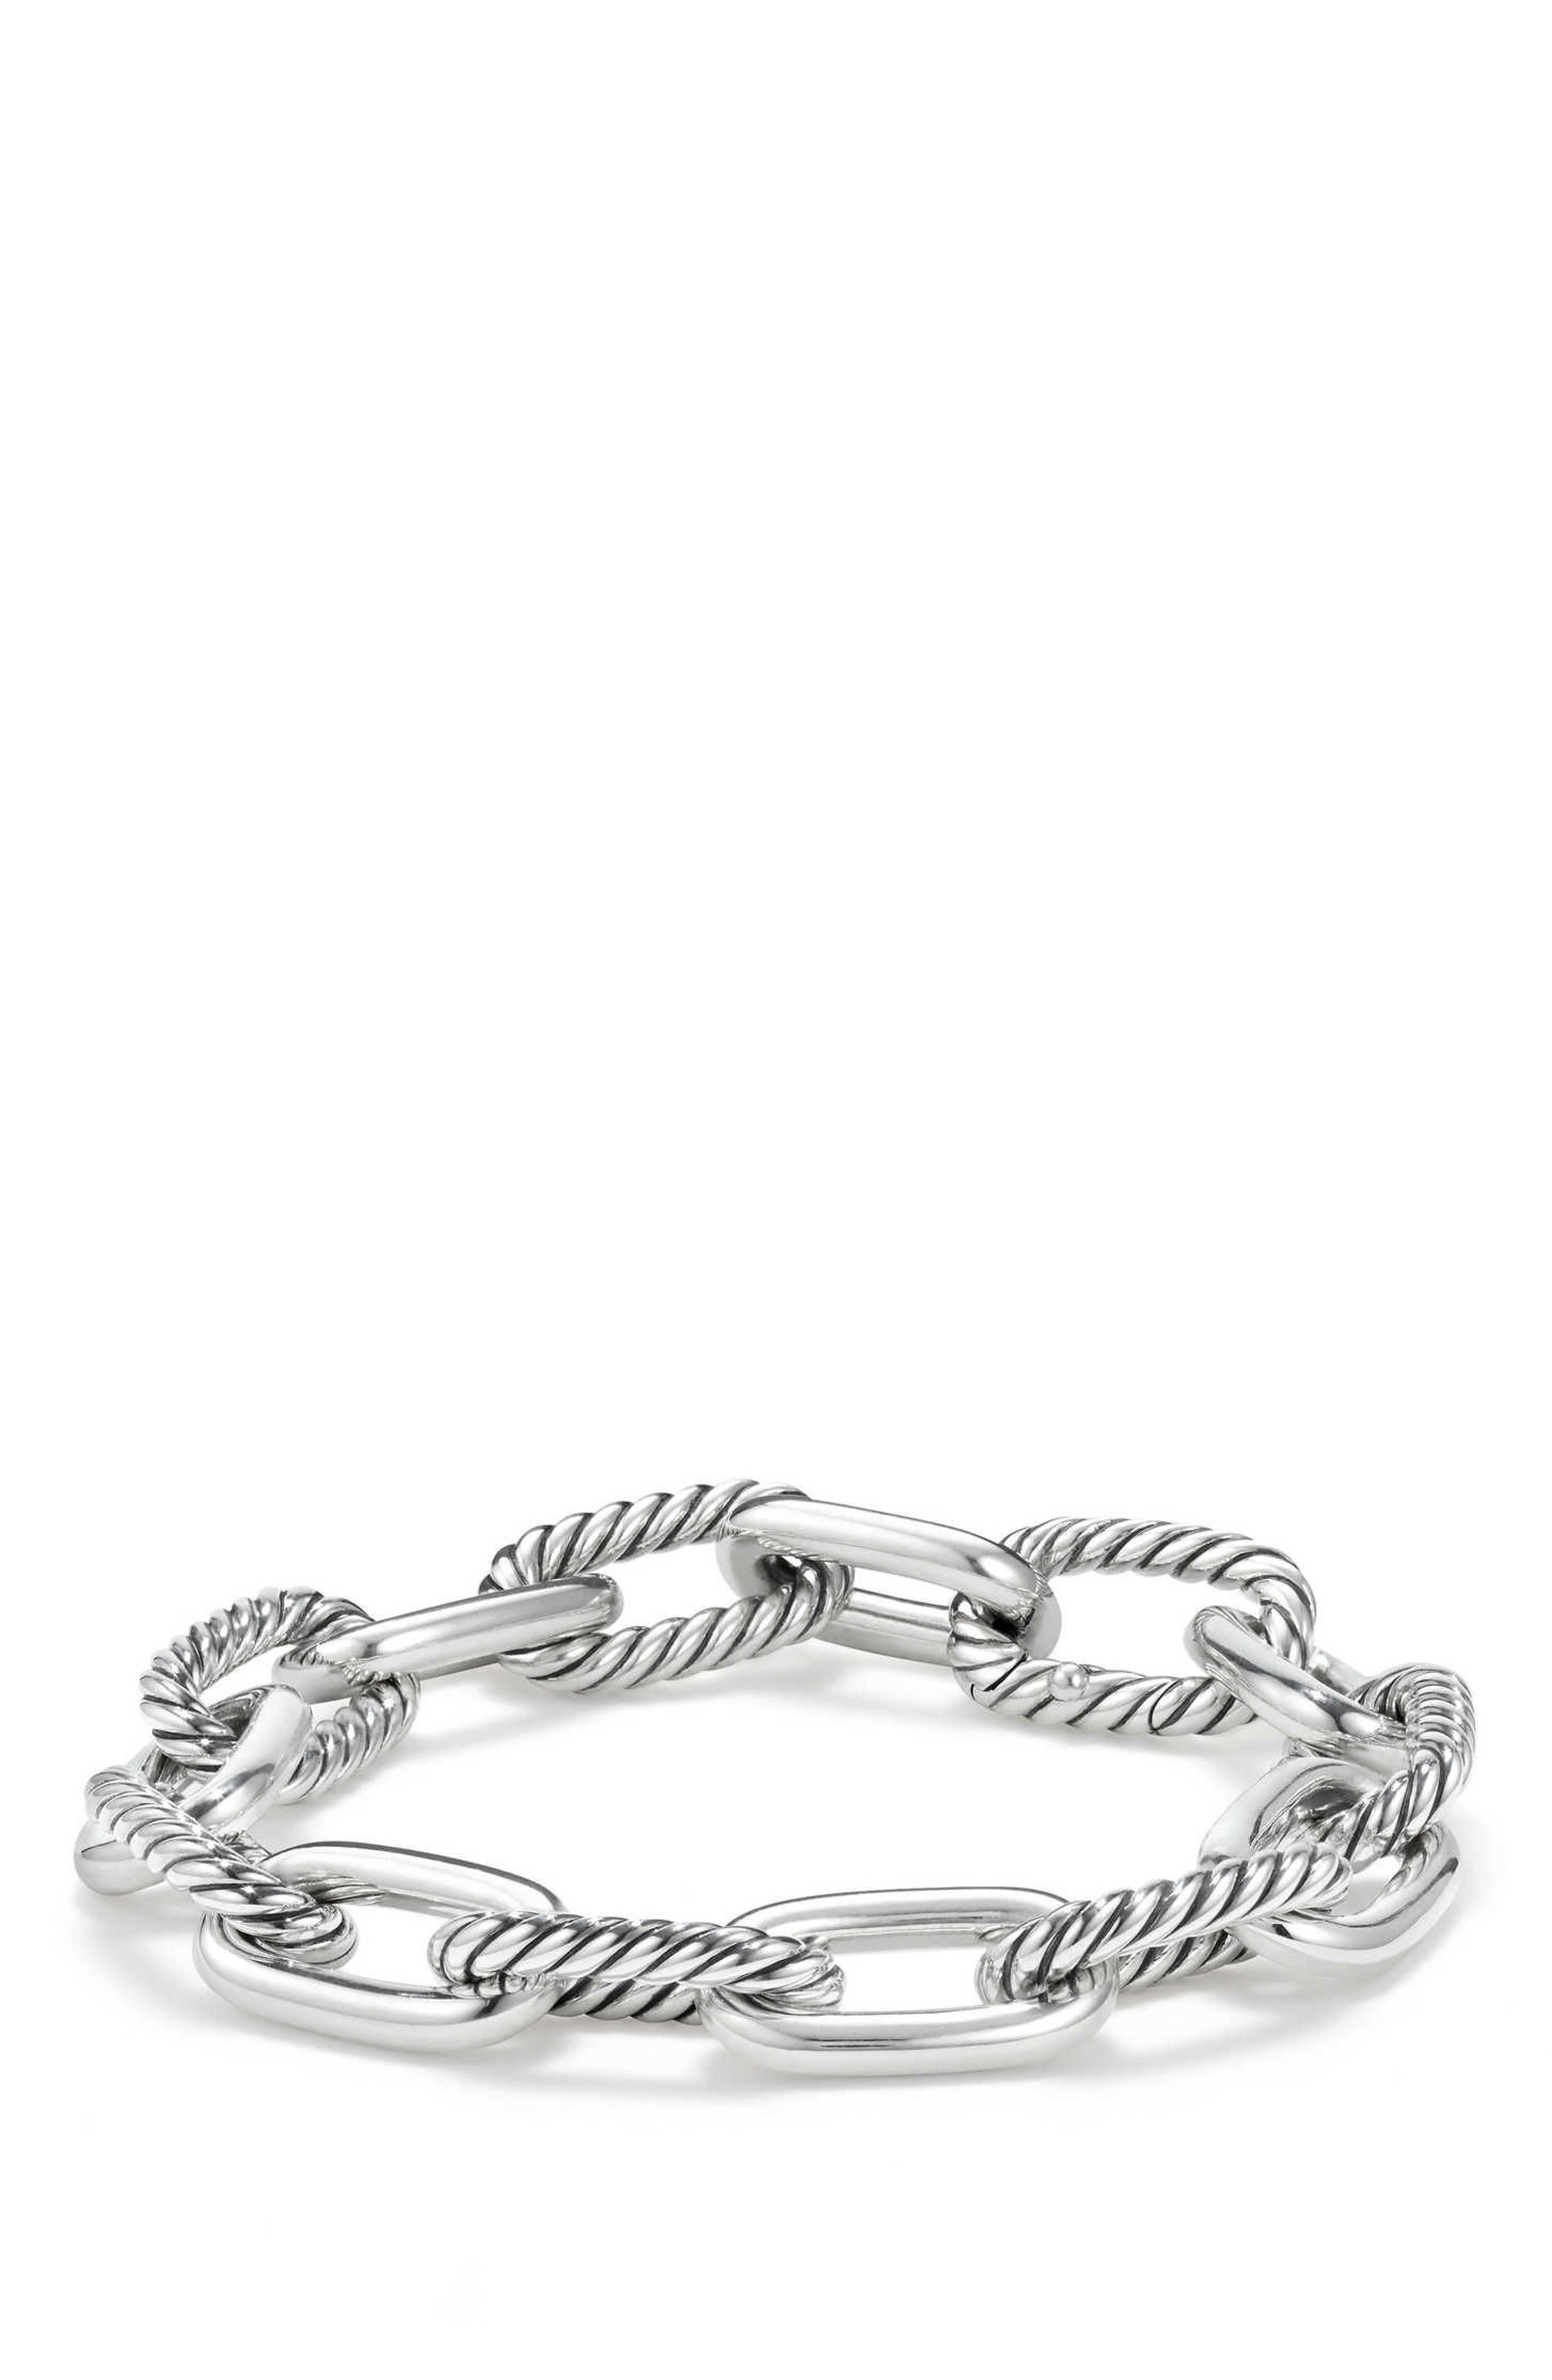 Alternate Image 1 Selected - David Yurman DY Madison Chain Medium Bracelet